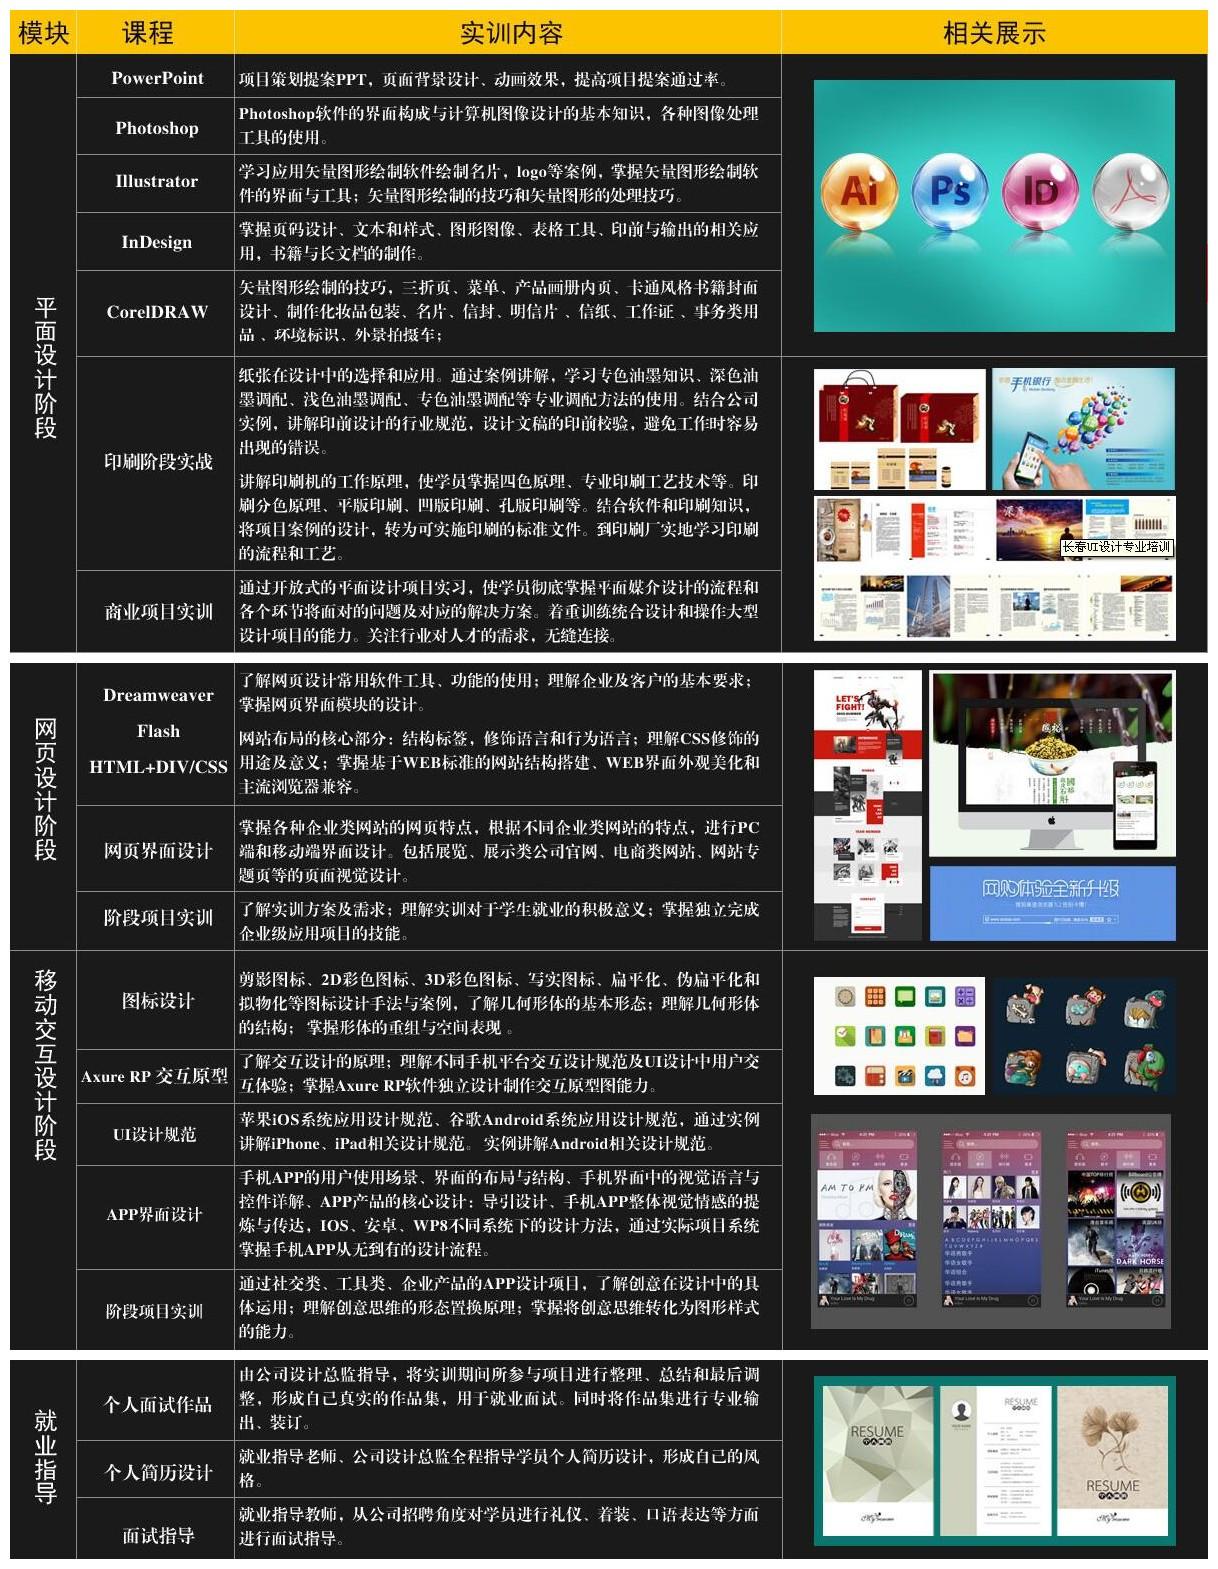 UI界面设计师Creo用于家具设计可图片